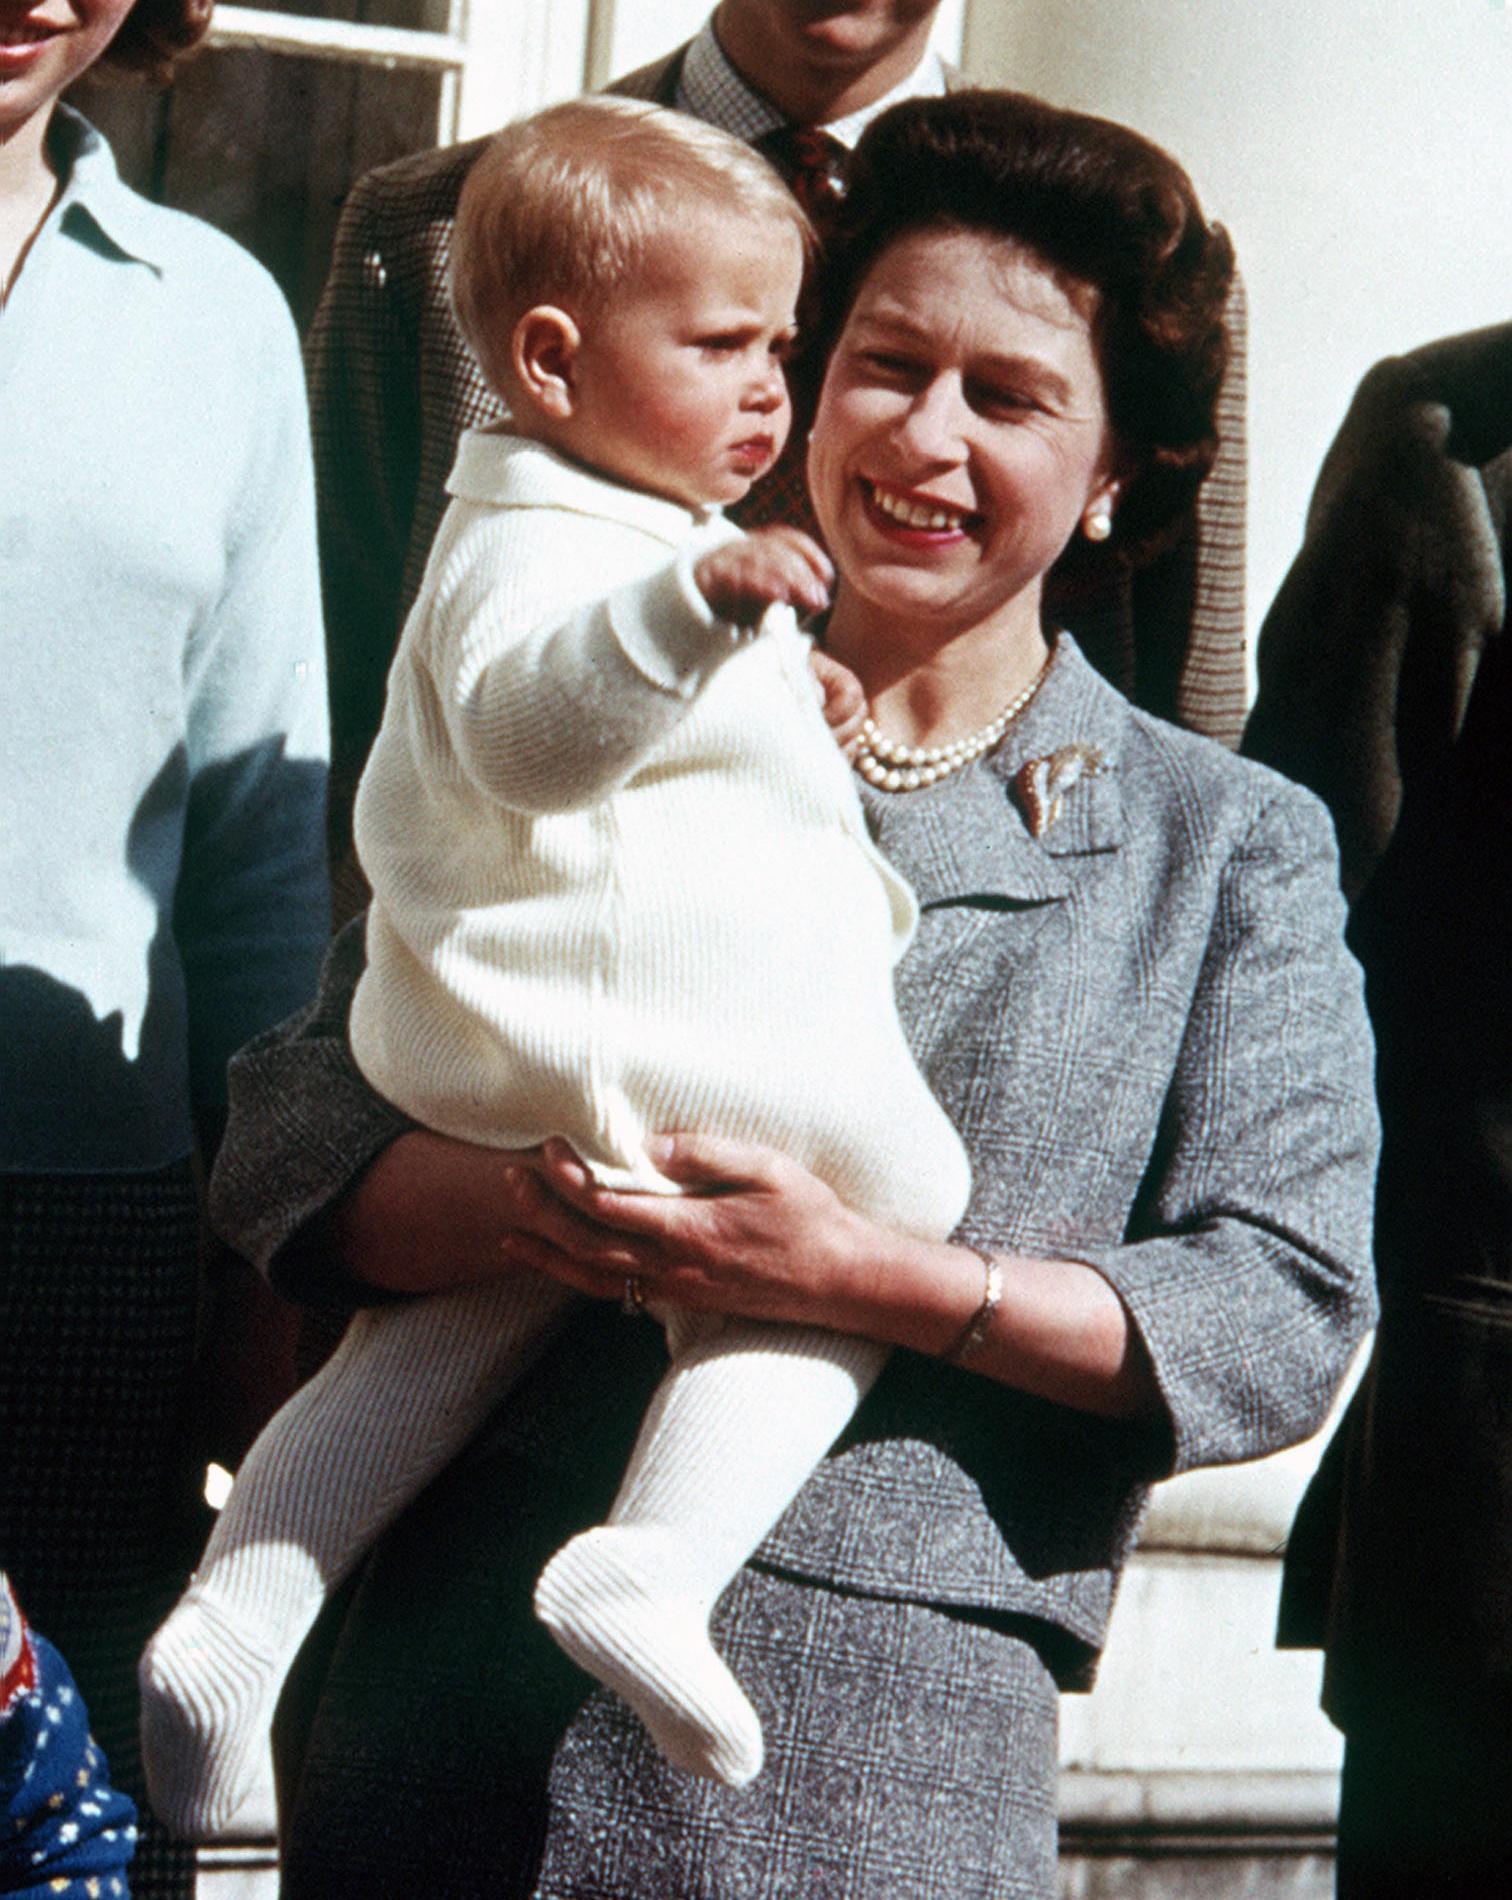 Edward, le fils discret de la reine Elizabeth II